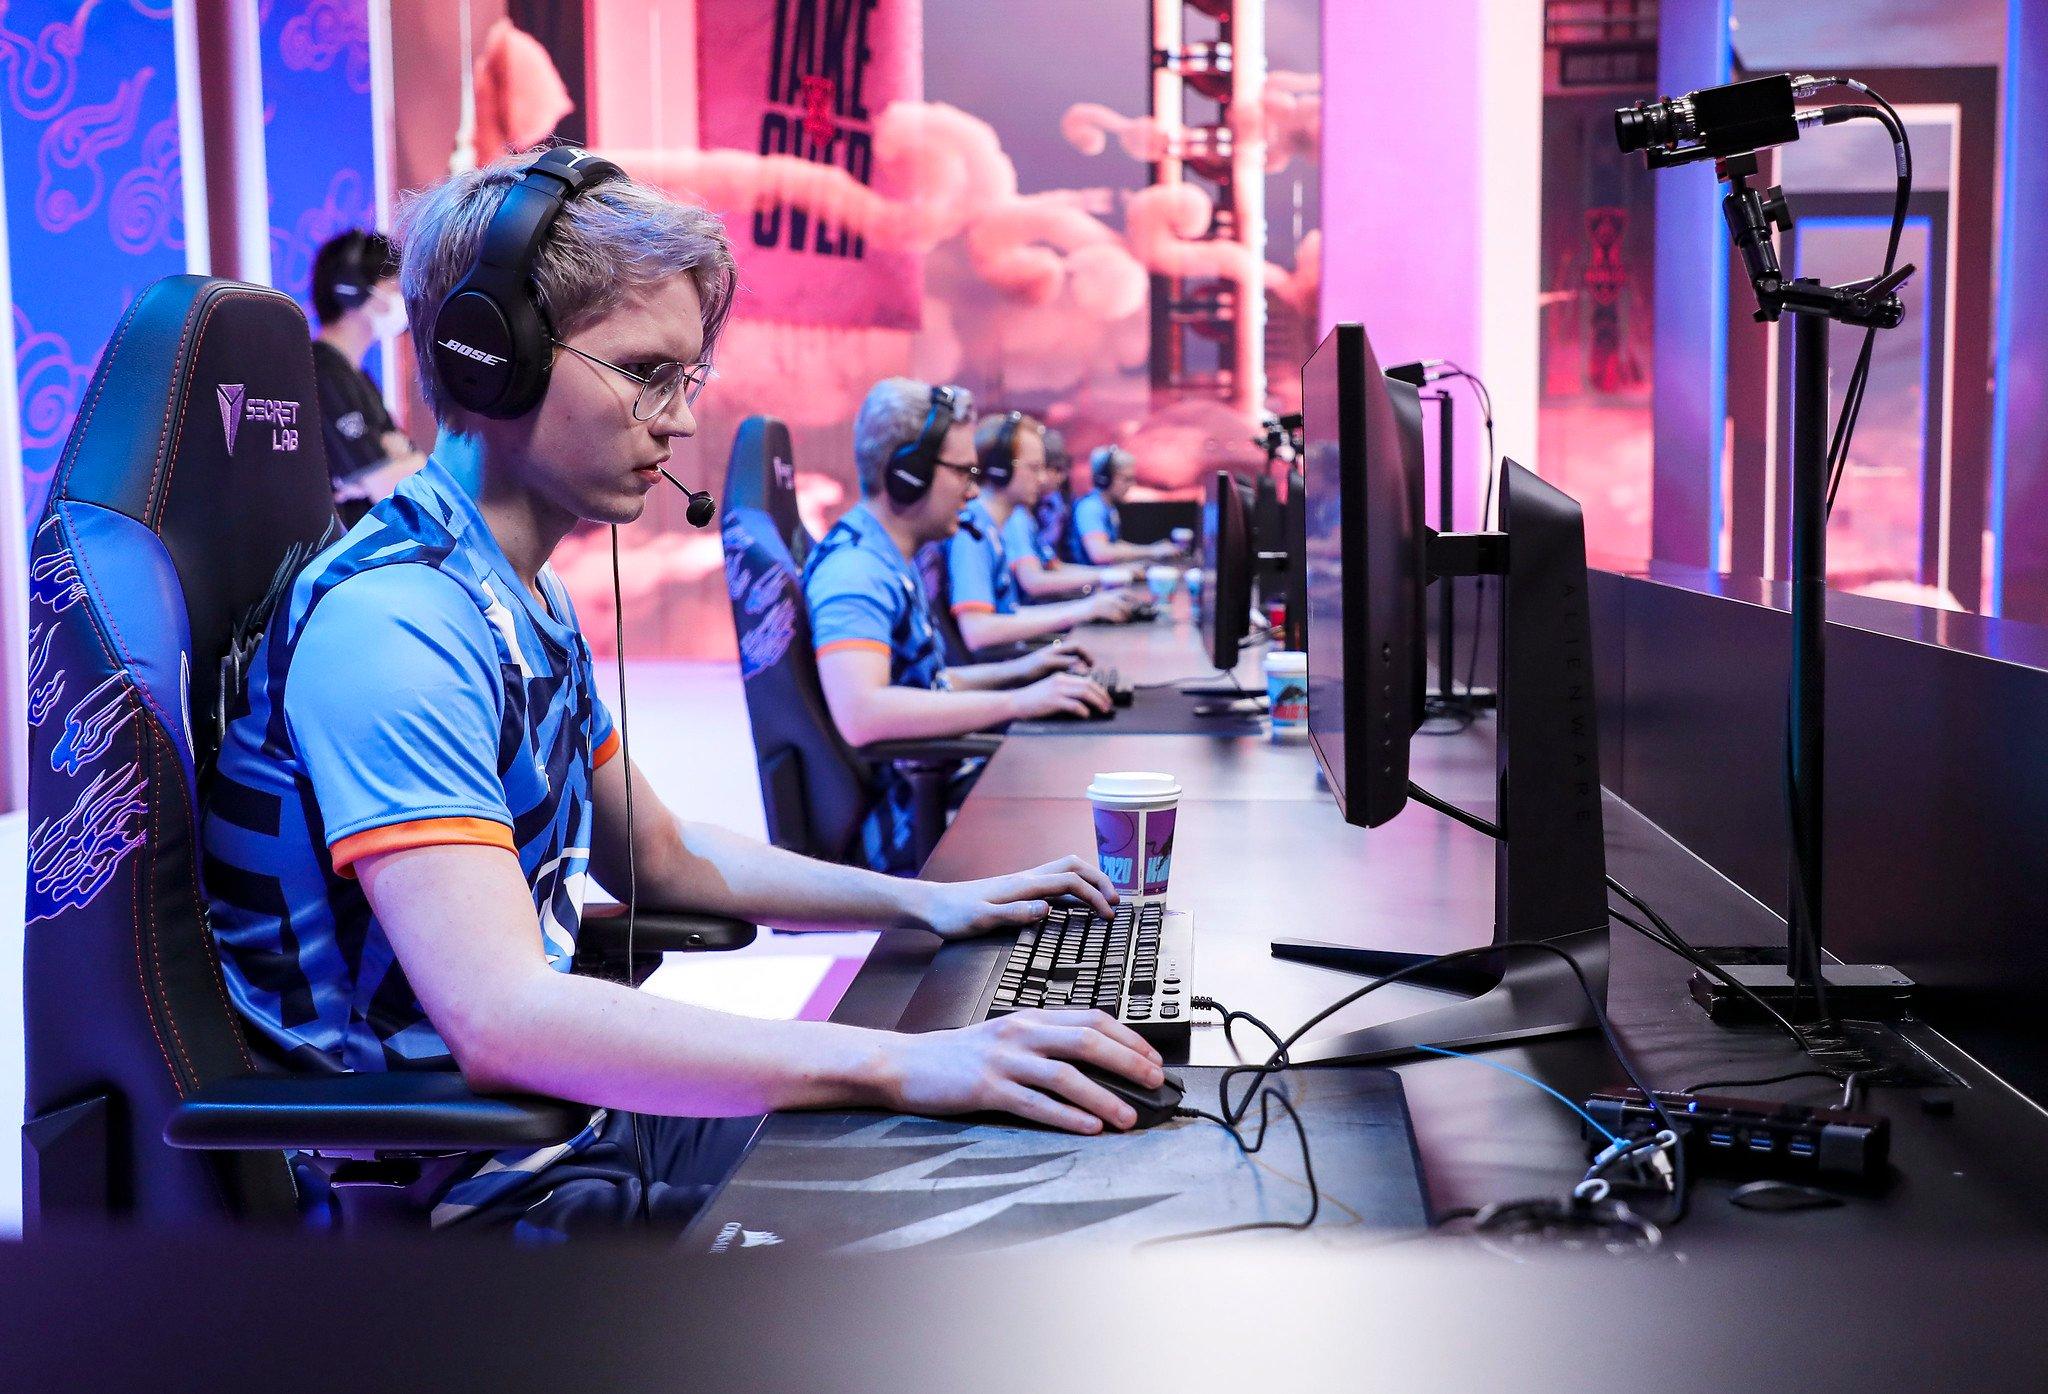 League Of Legends World Championship 2020 Main Group Event Day Six: PSG Talon Versus Rogue